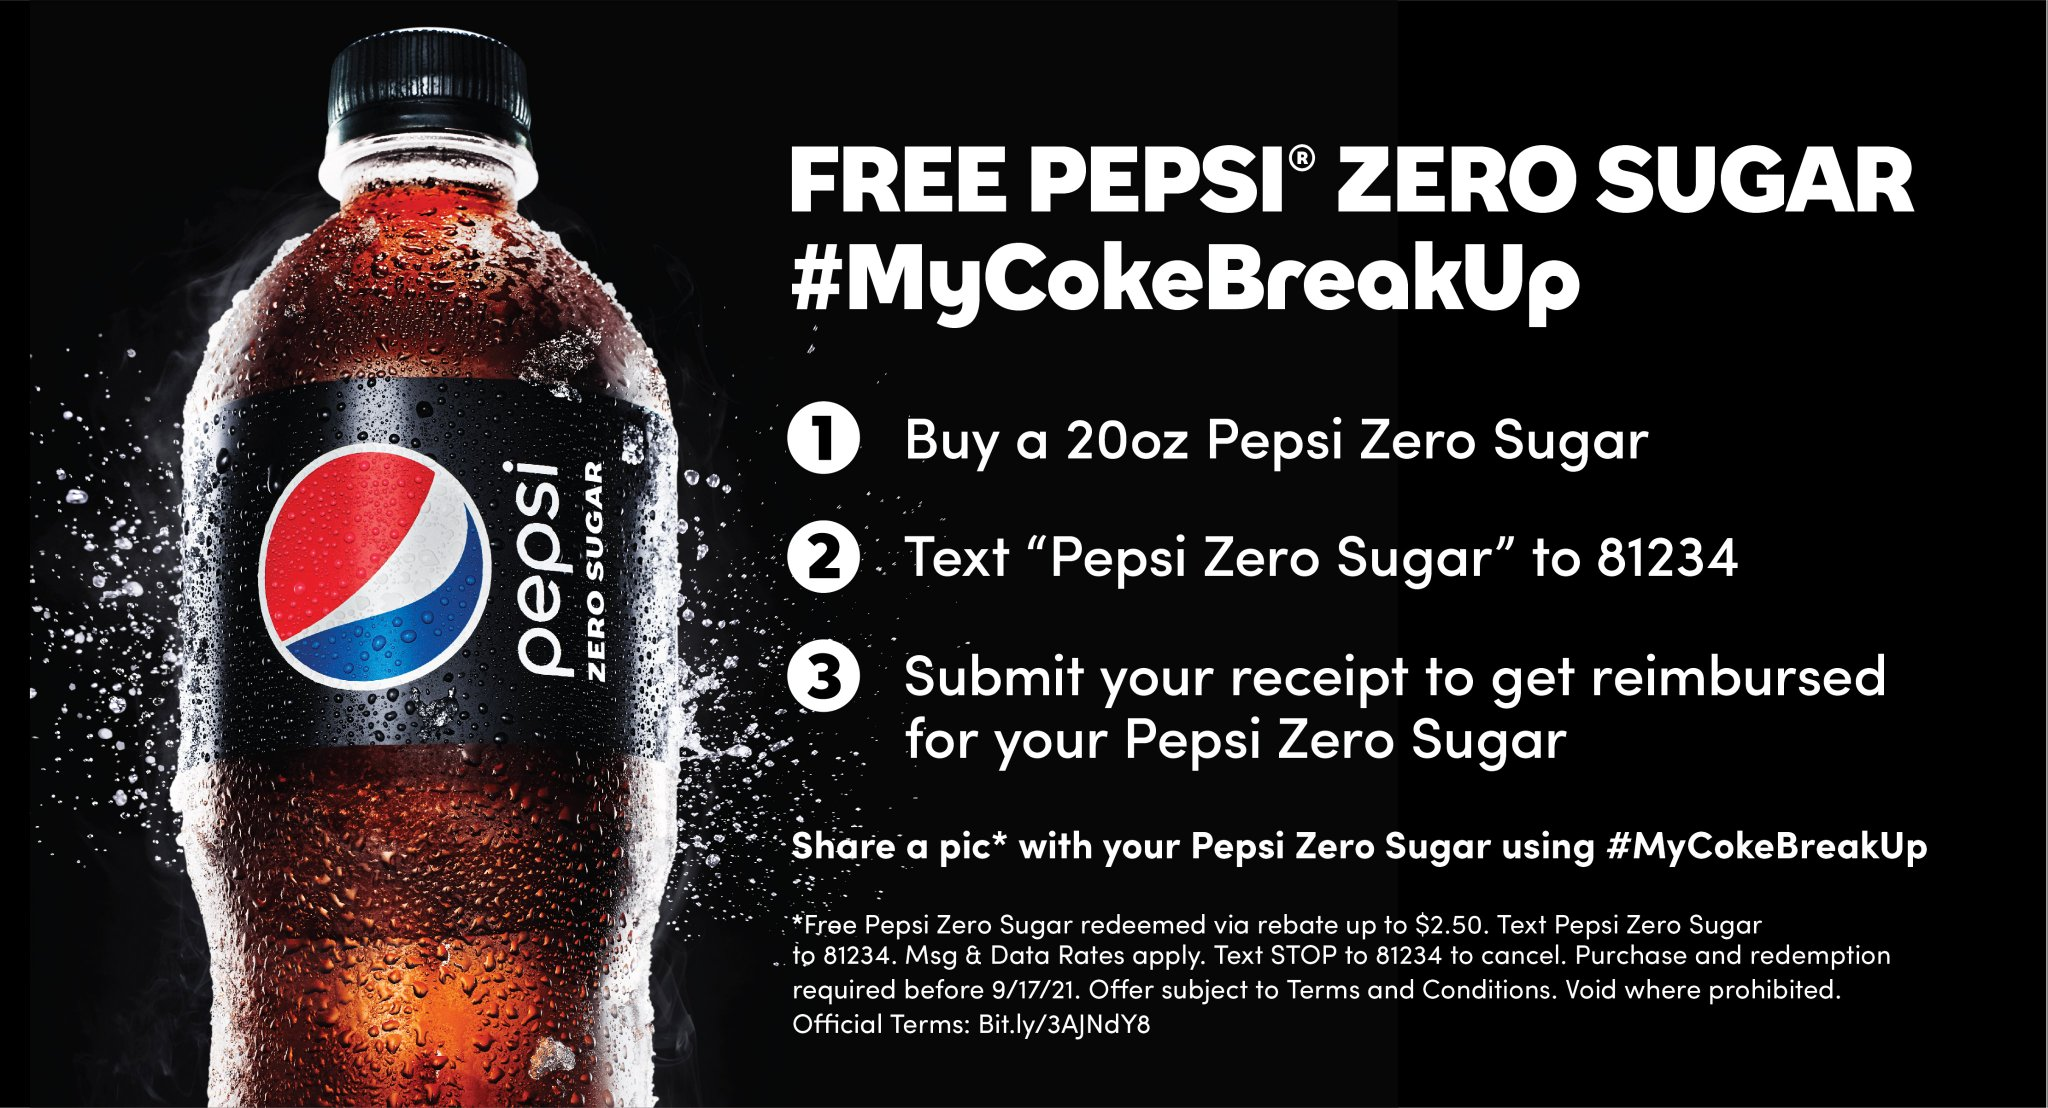 Free Pepsi Zero Sugar